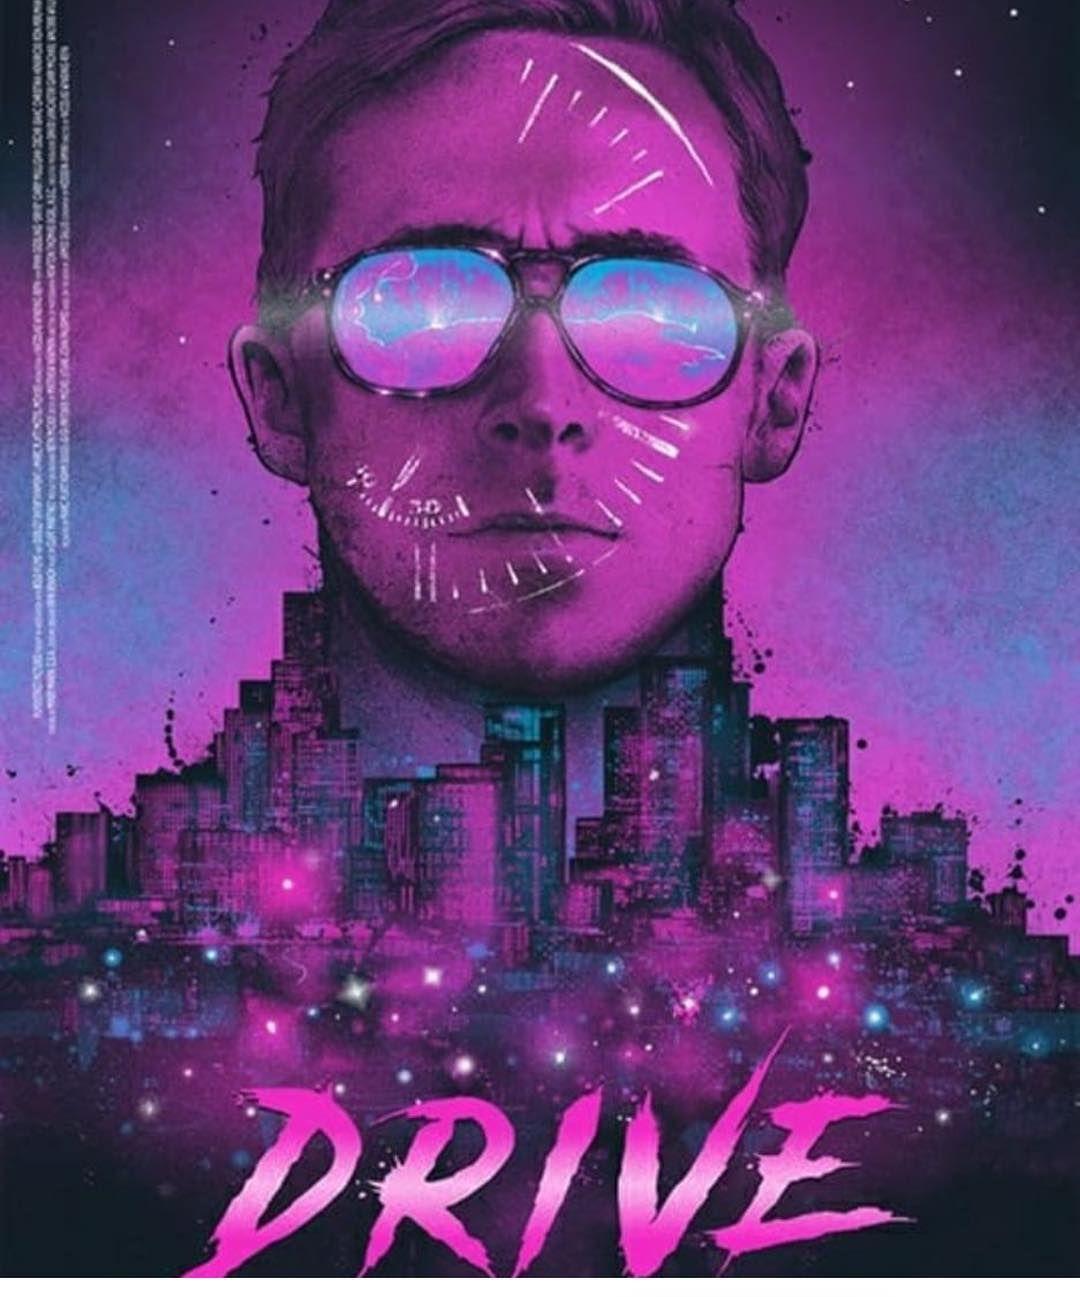 Poster RYAN GOSLING DRIVE 02 WALL ART